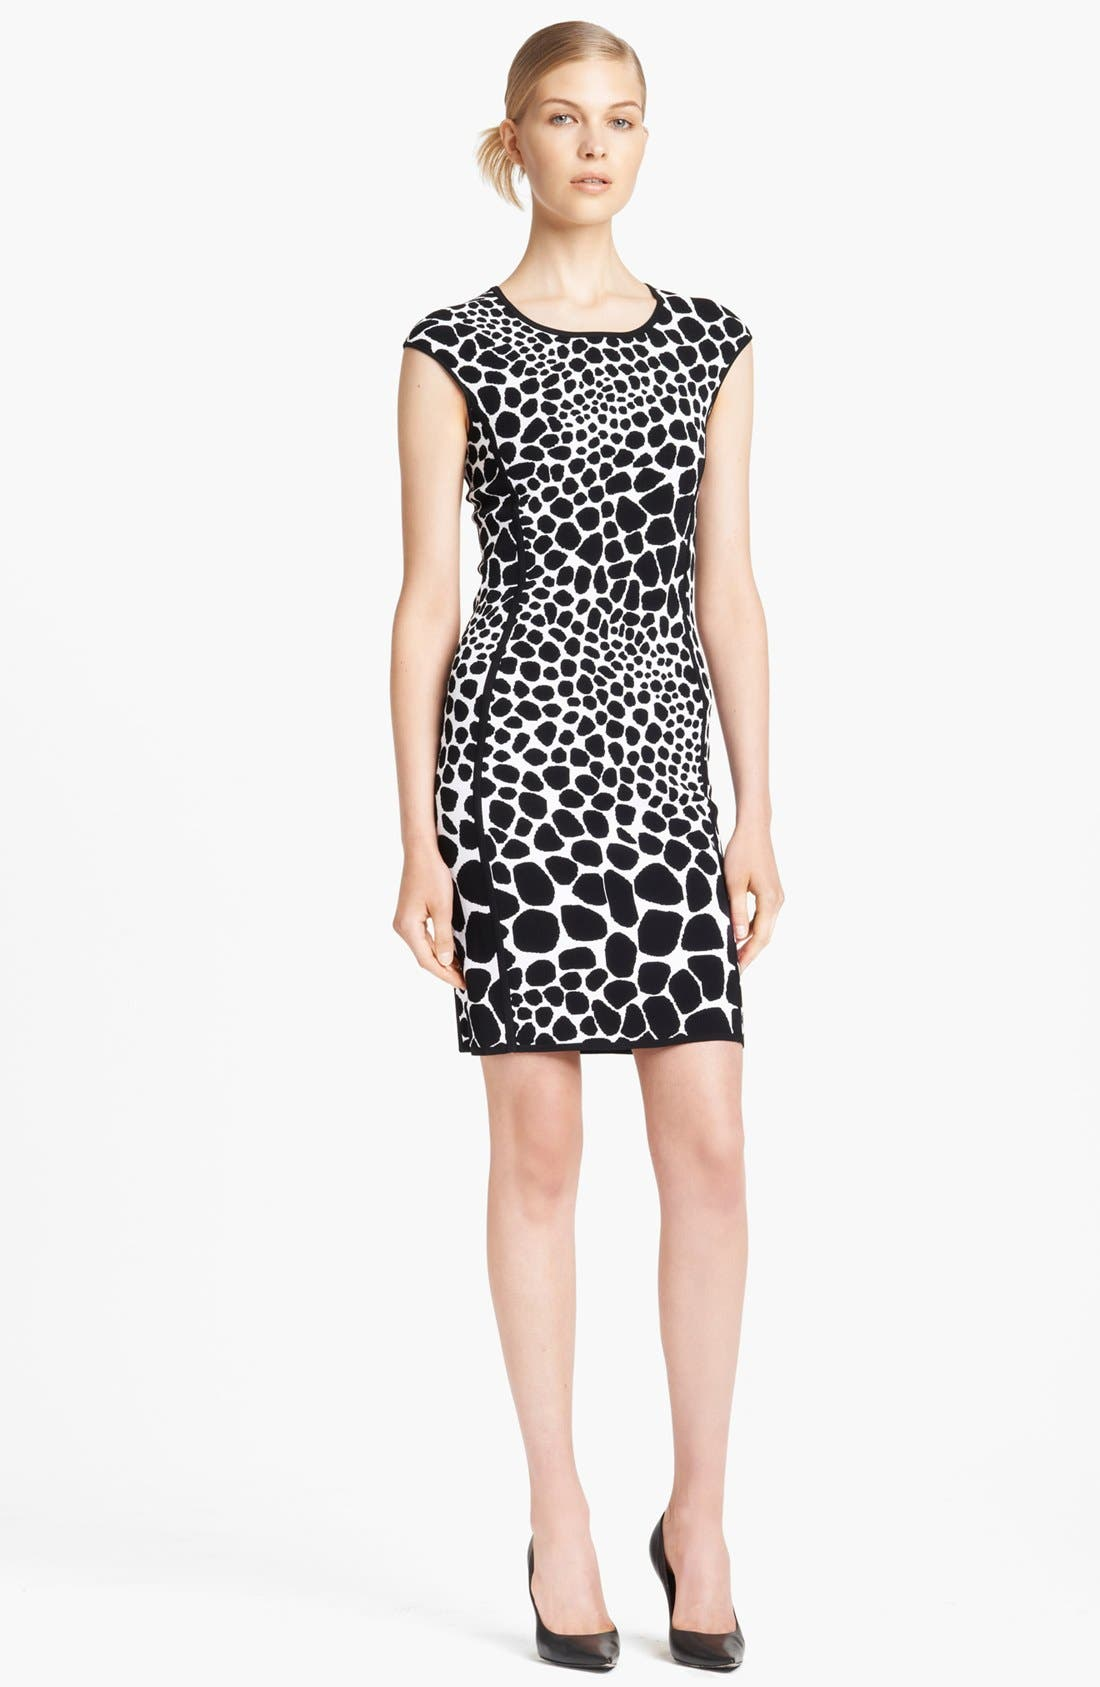 Alternate Image 1 Selected - Michael Kors Giraffe Pattern Knit Dress